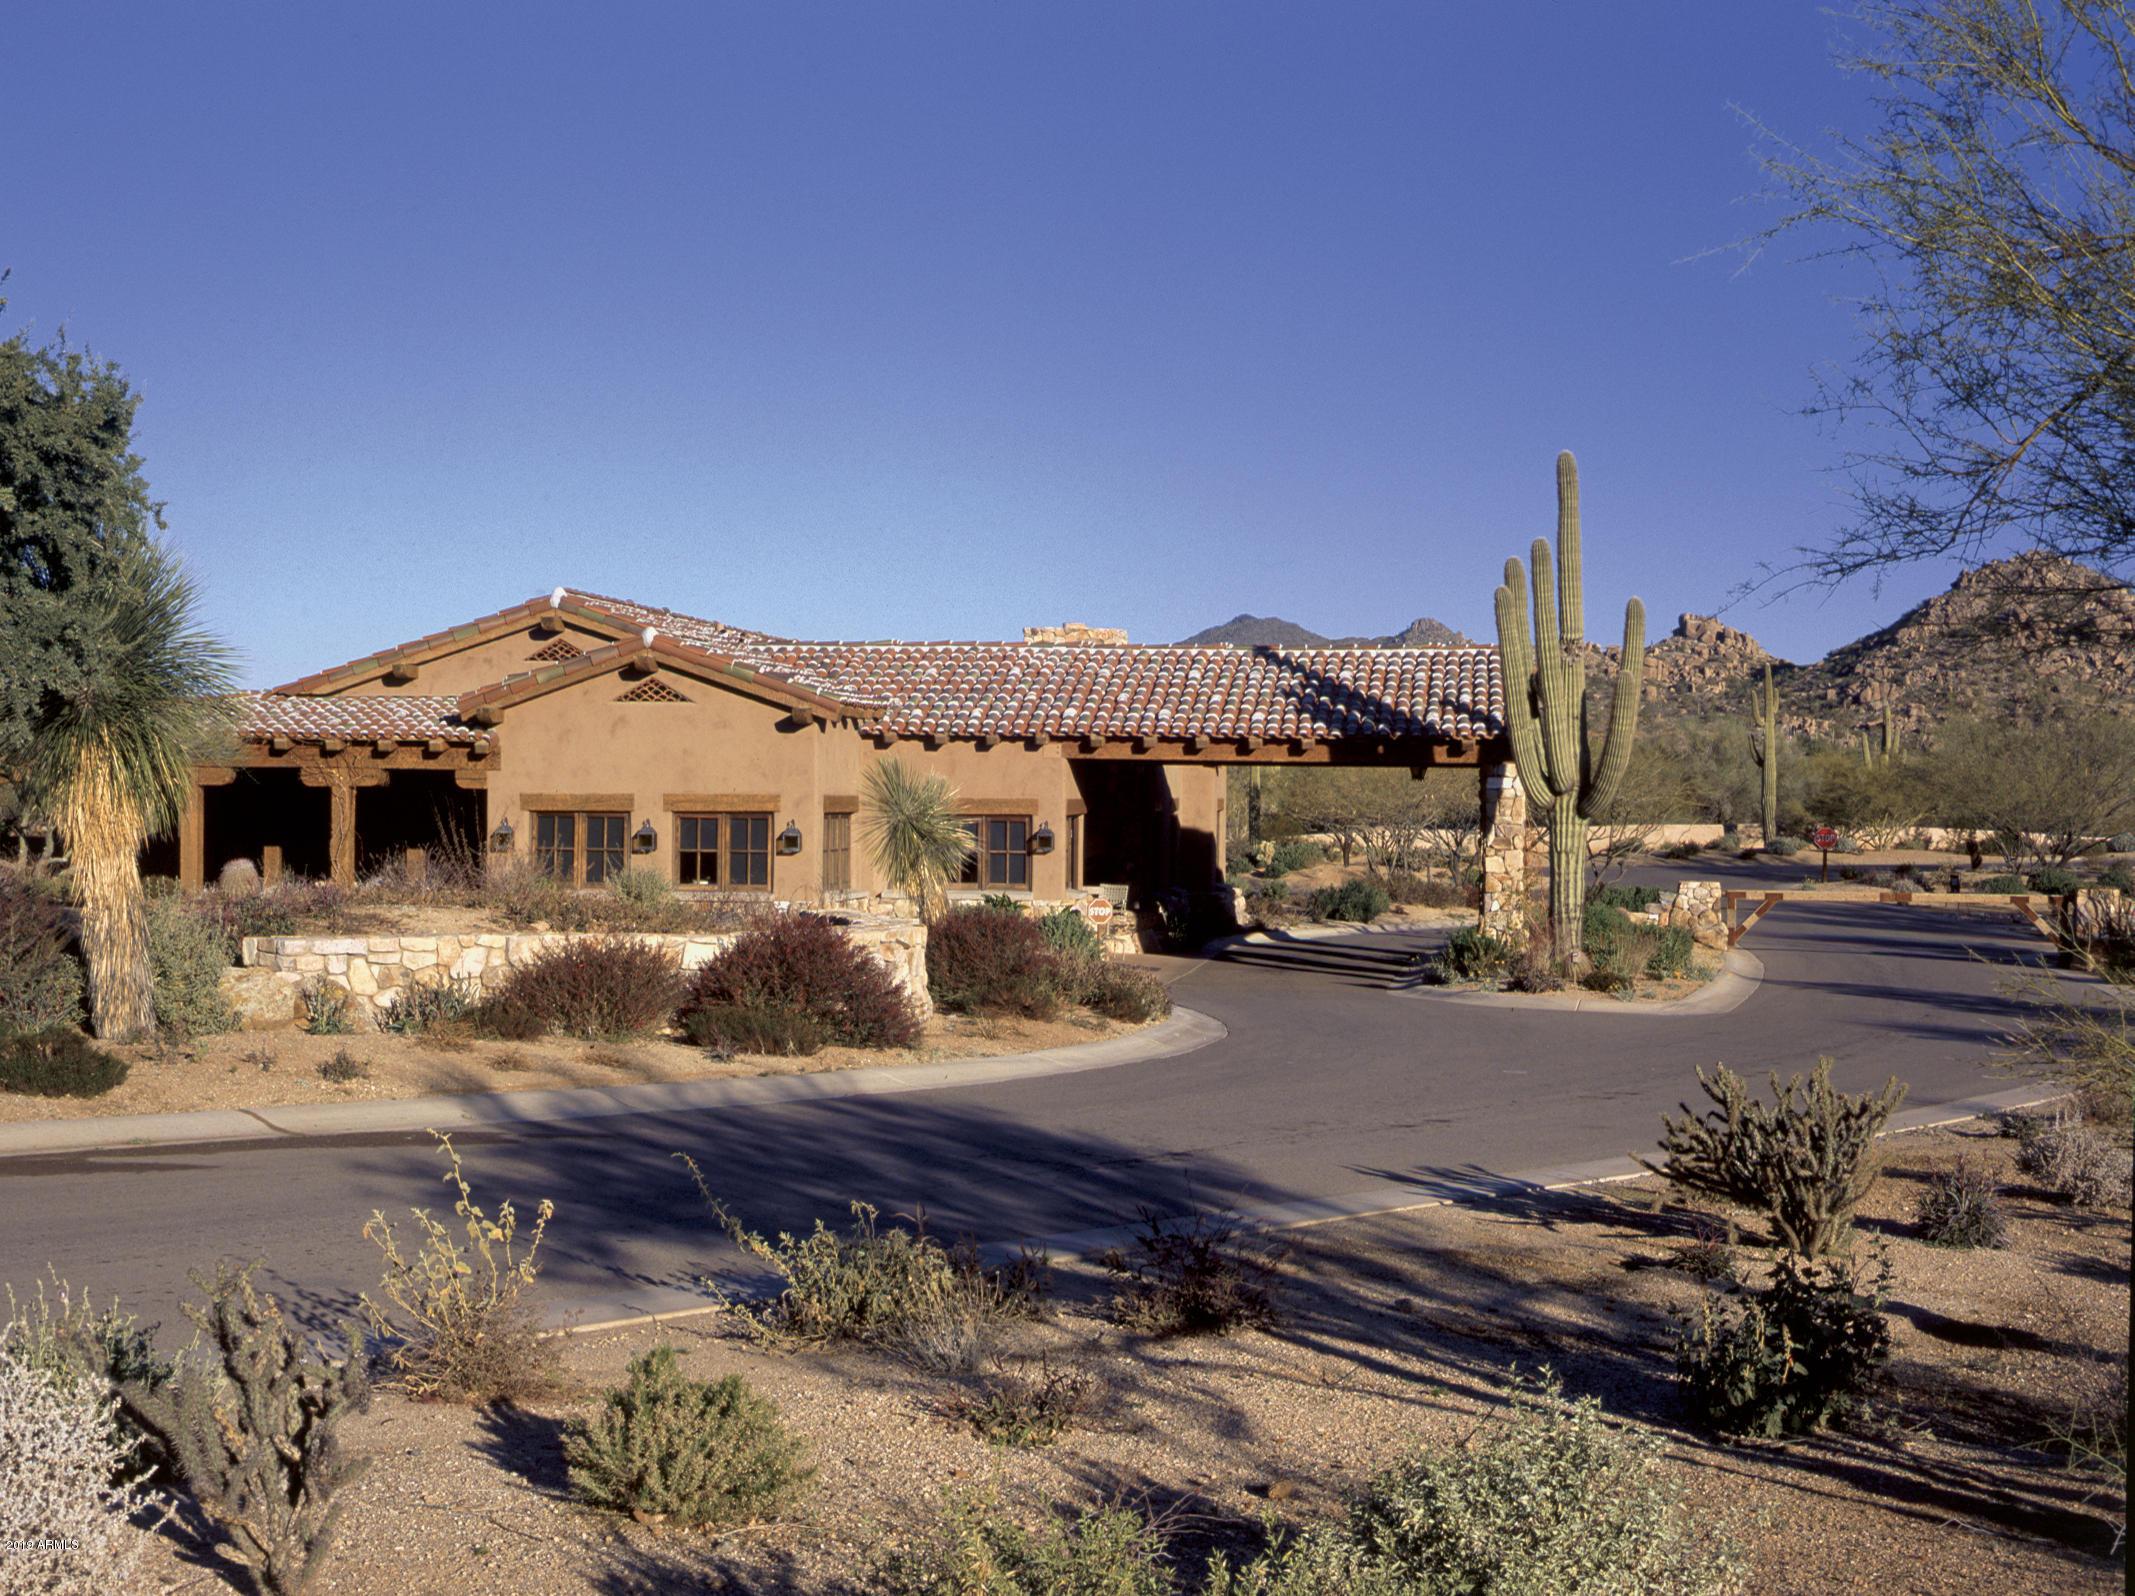 MLS 5897483 7327 E SONORAN Trail, Scottsdale, AZ 85266 Scottsdale AZ Whisper Rock